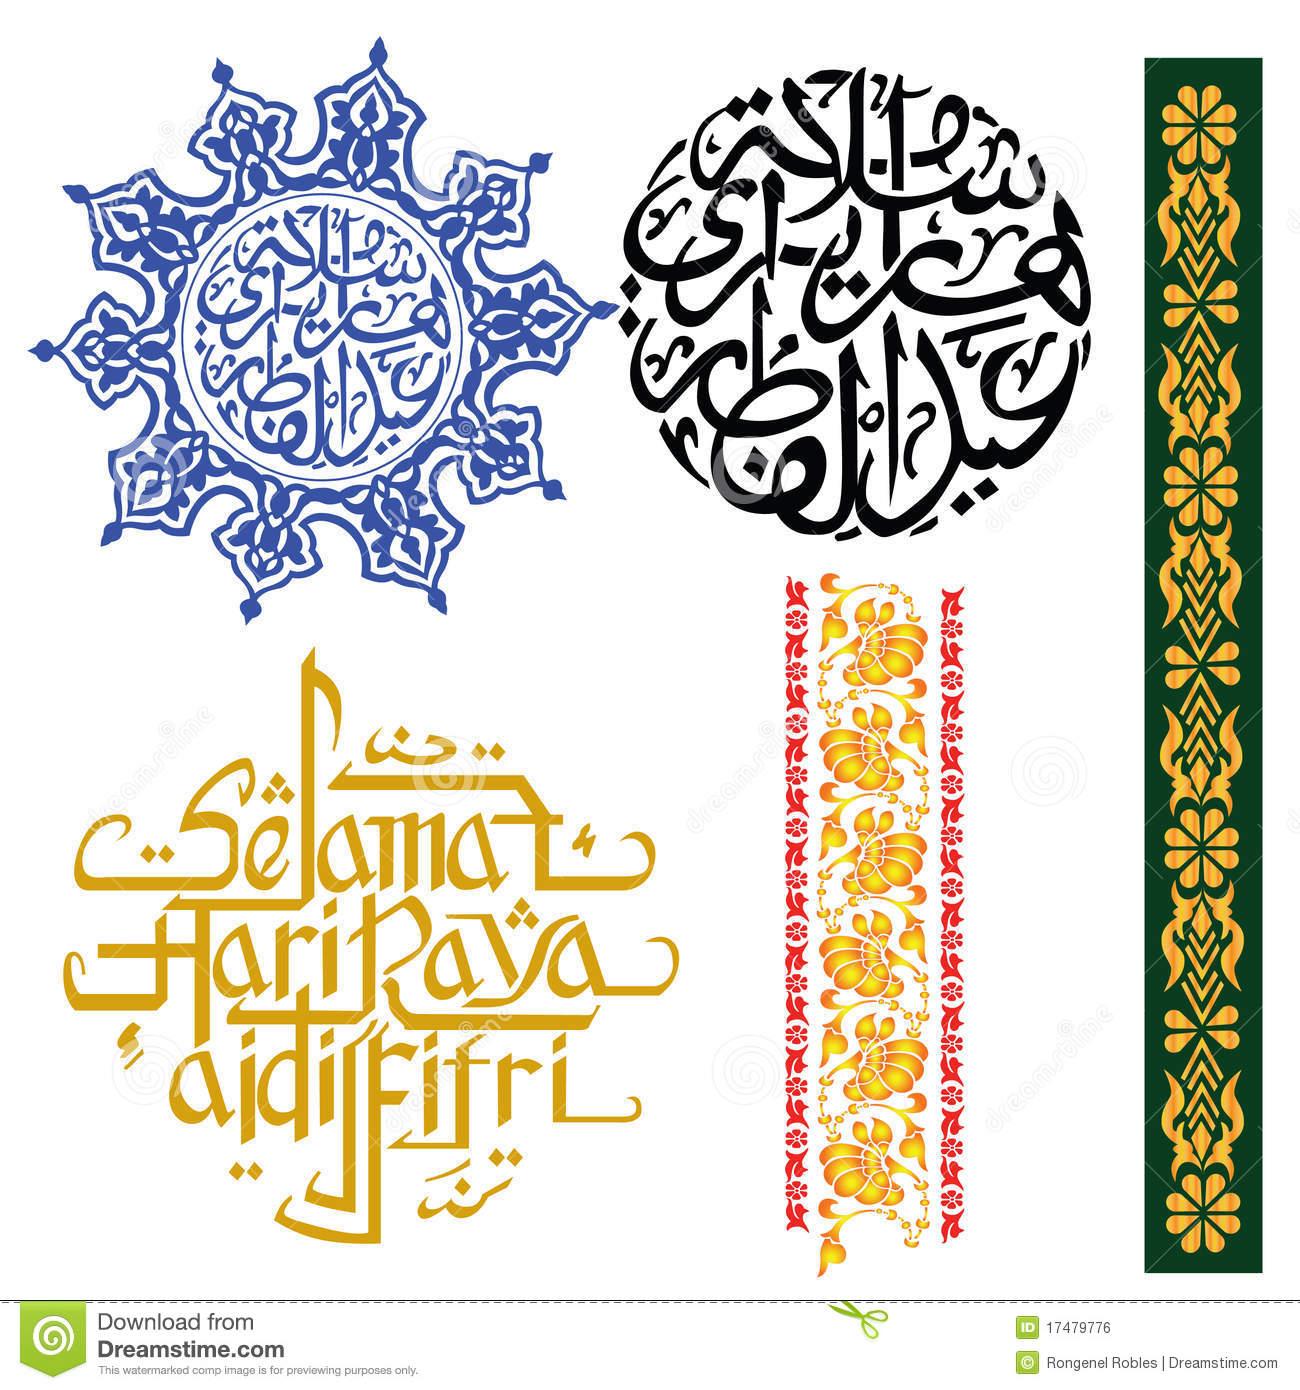 Bingkai kaligrafi vector